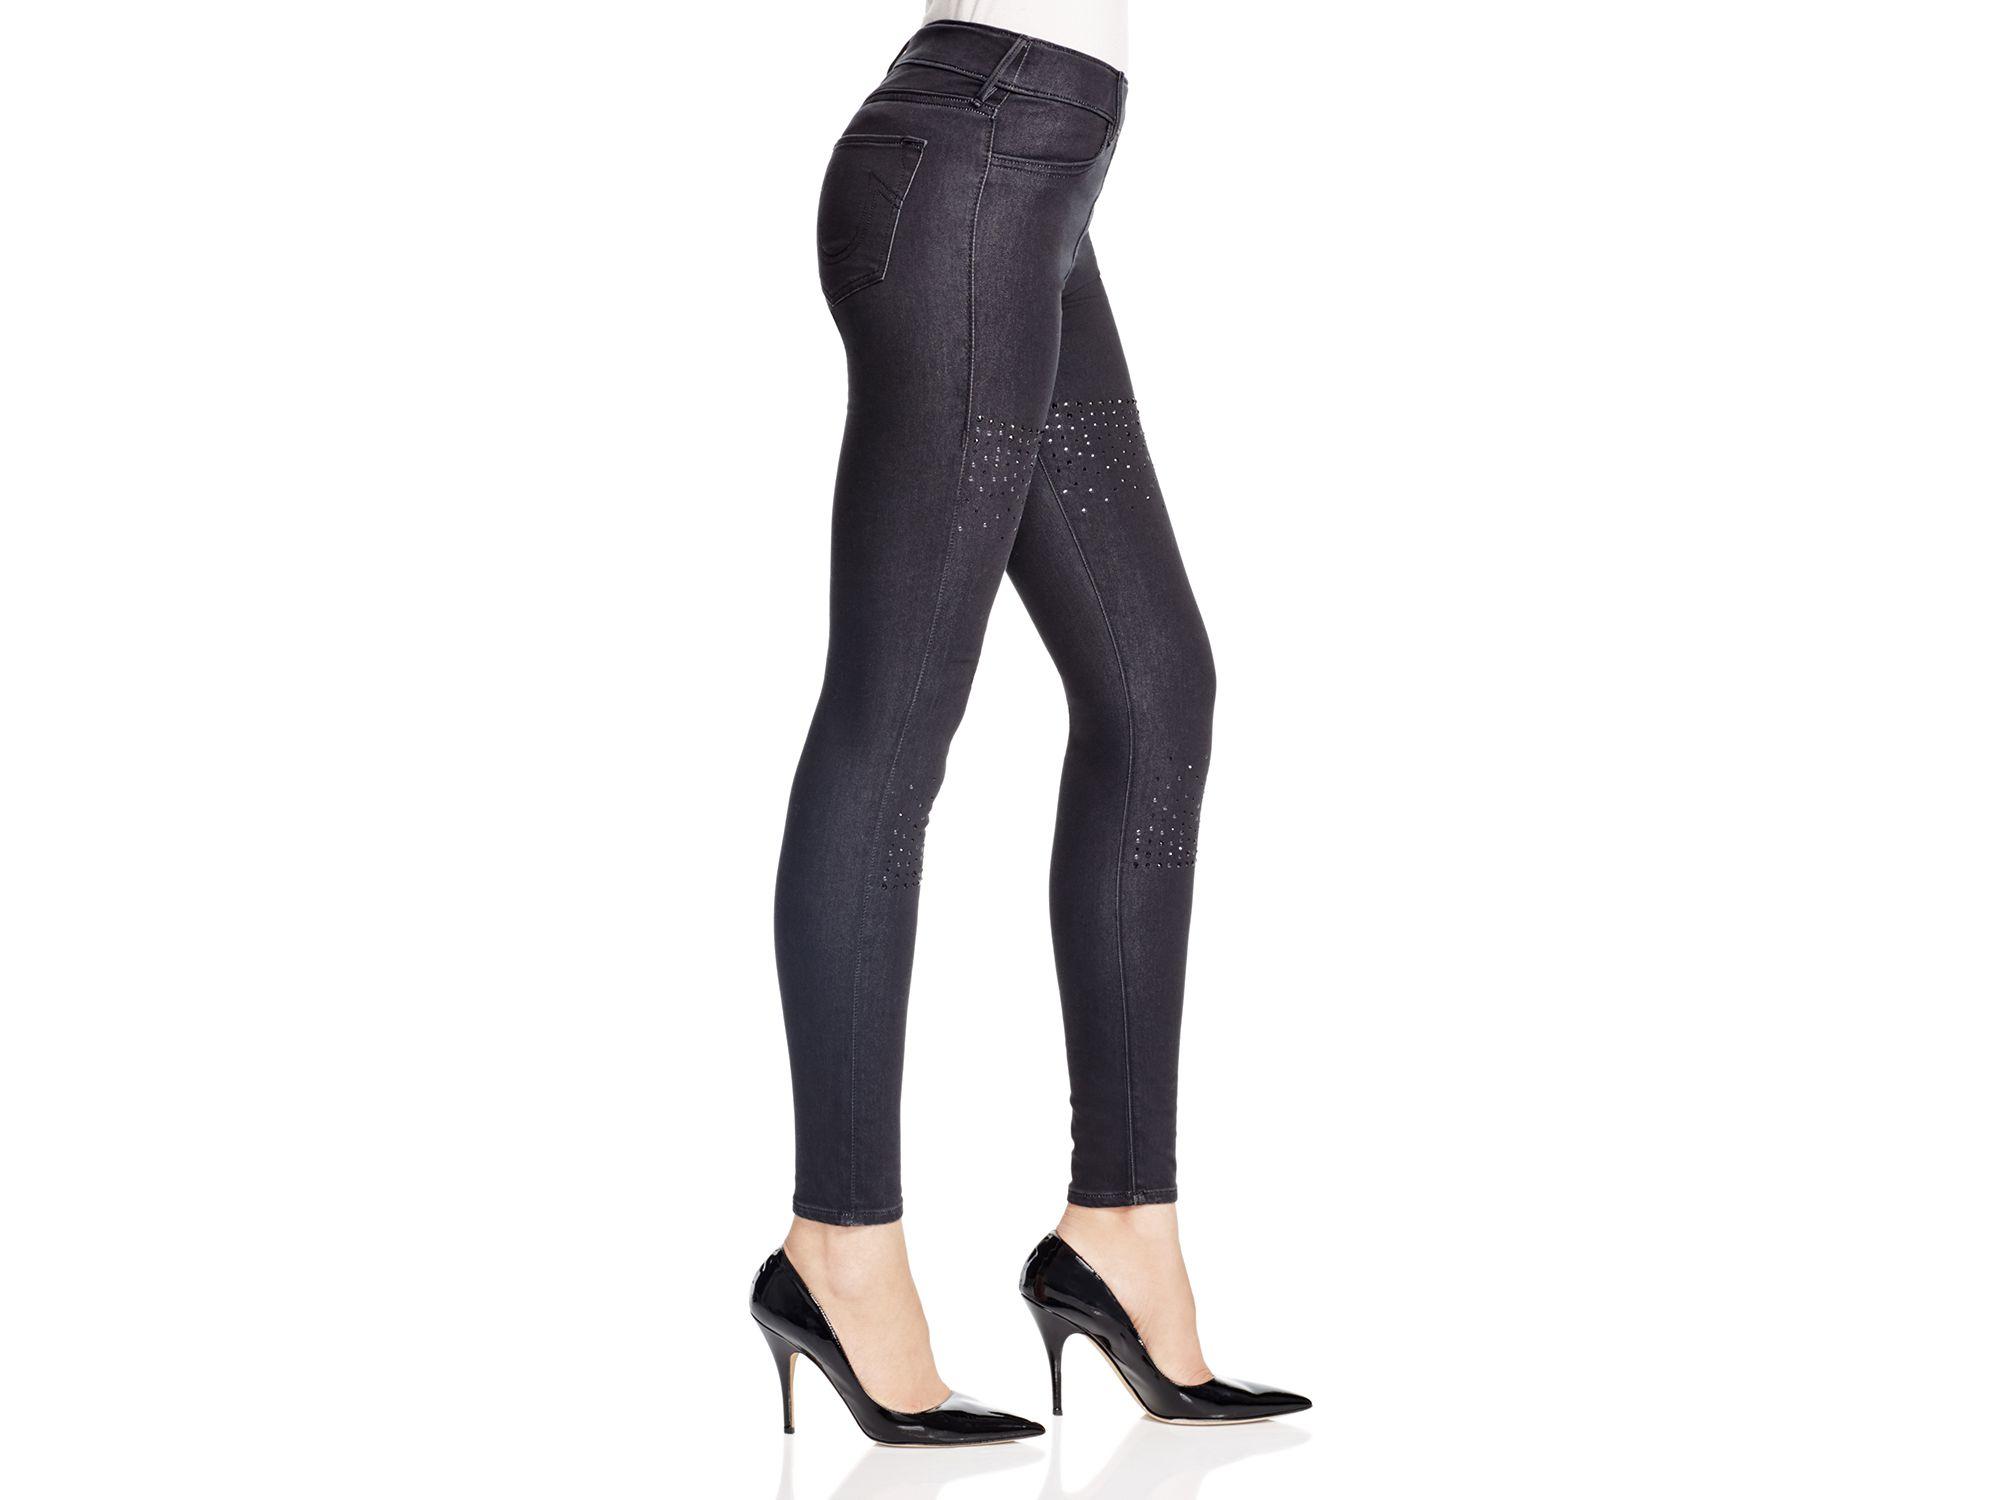 60c8fcb43e0c3 True Religion Runway Denim Leggings In Black in Black - Lyst